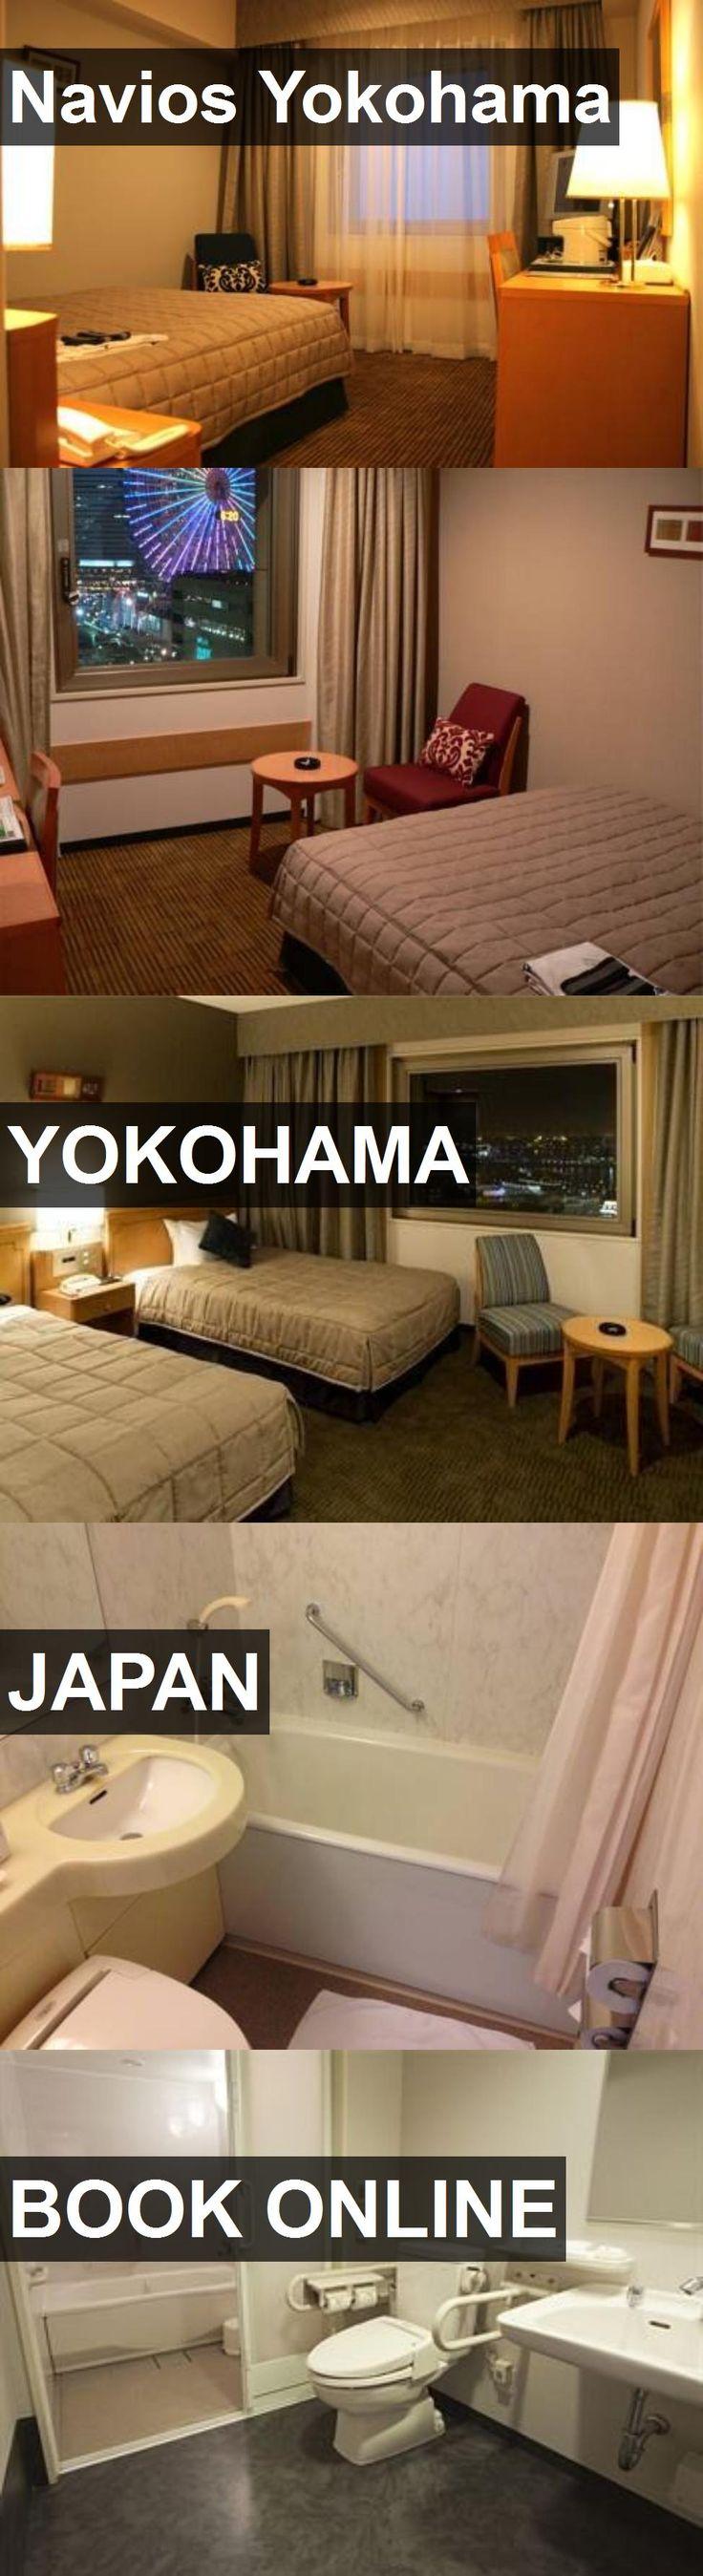 Hotel Navios Yokohama in Yokohama, Japan. For more information, photos, reviews and best prices please follow the link. #Japan #Yokohama #travel #vacation #hotel